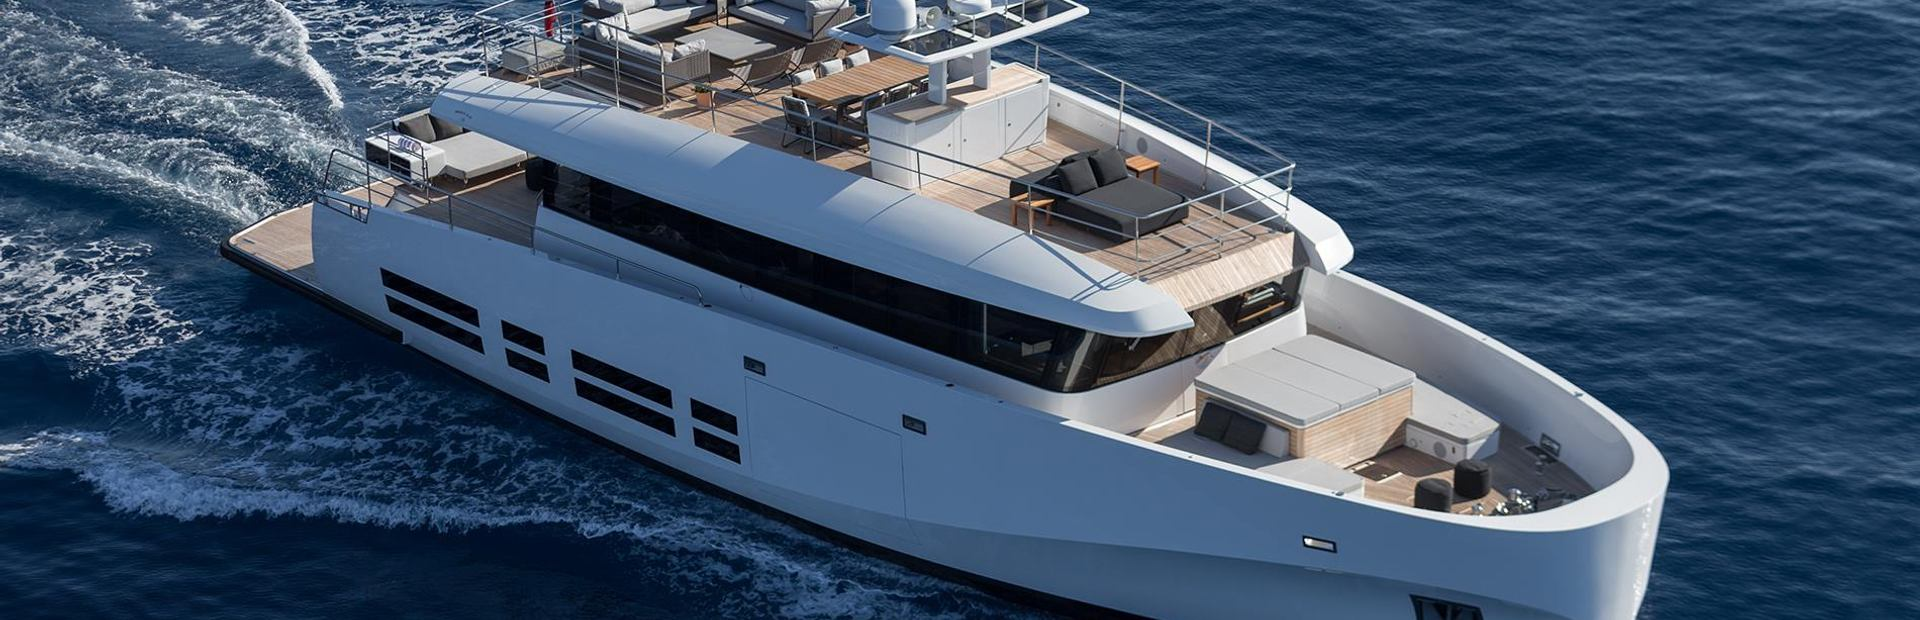 27 WallyAce Yacht Charter